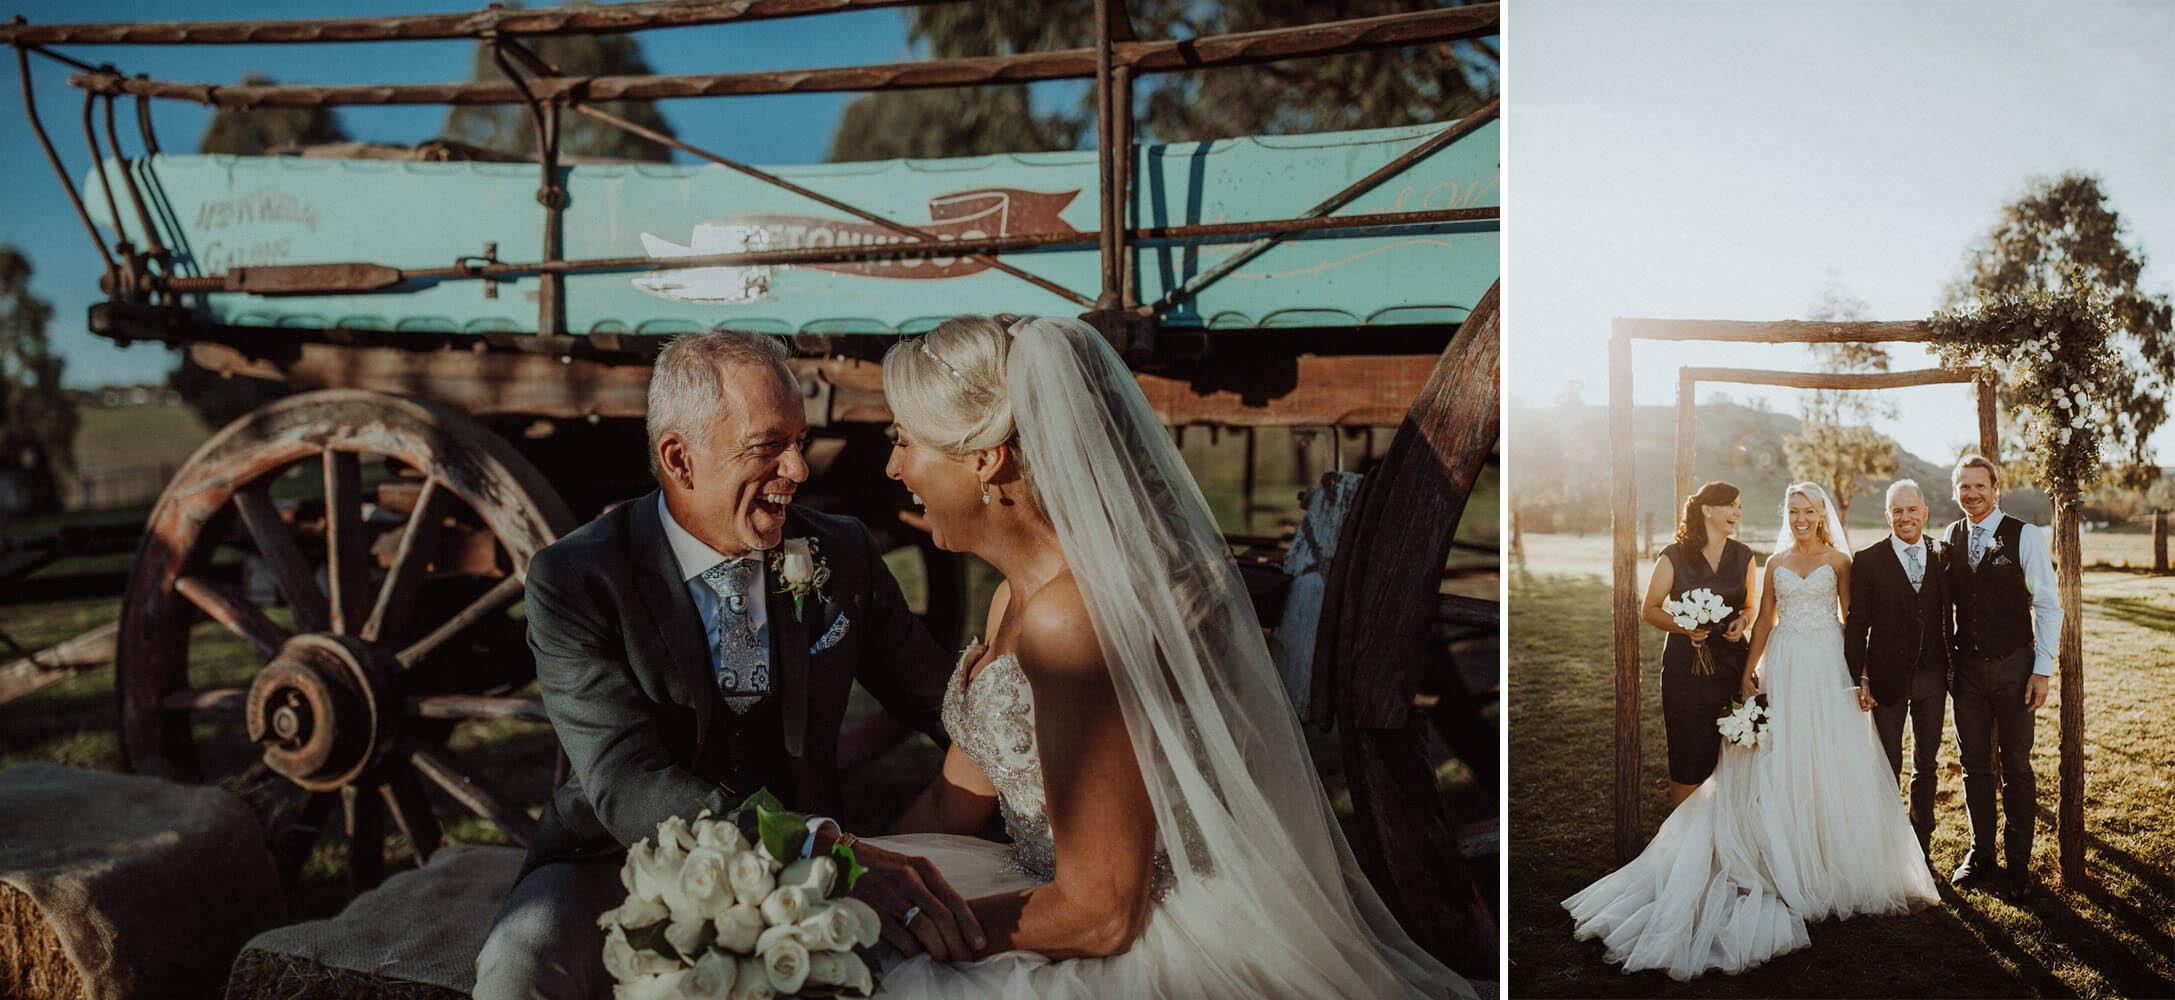 australian-country-wedding_101(0452)2.jpg